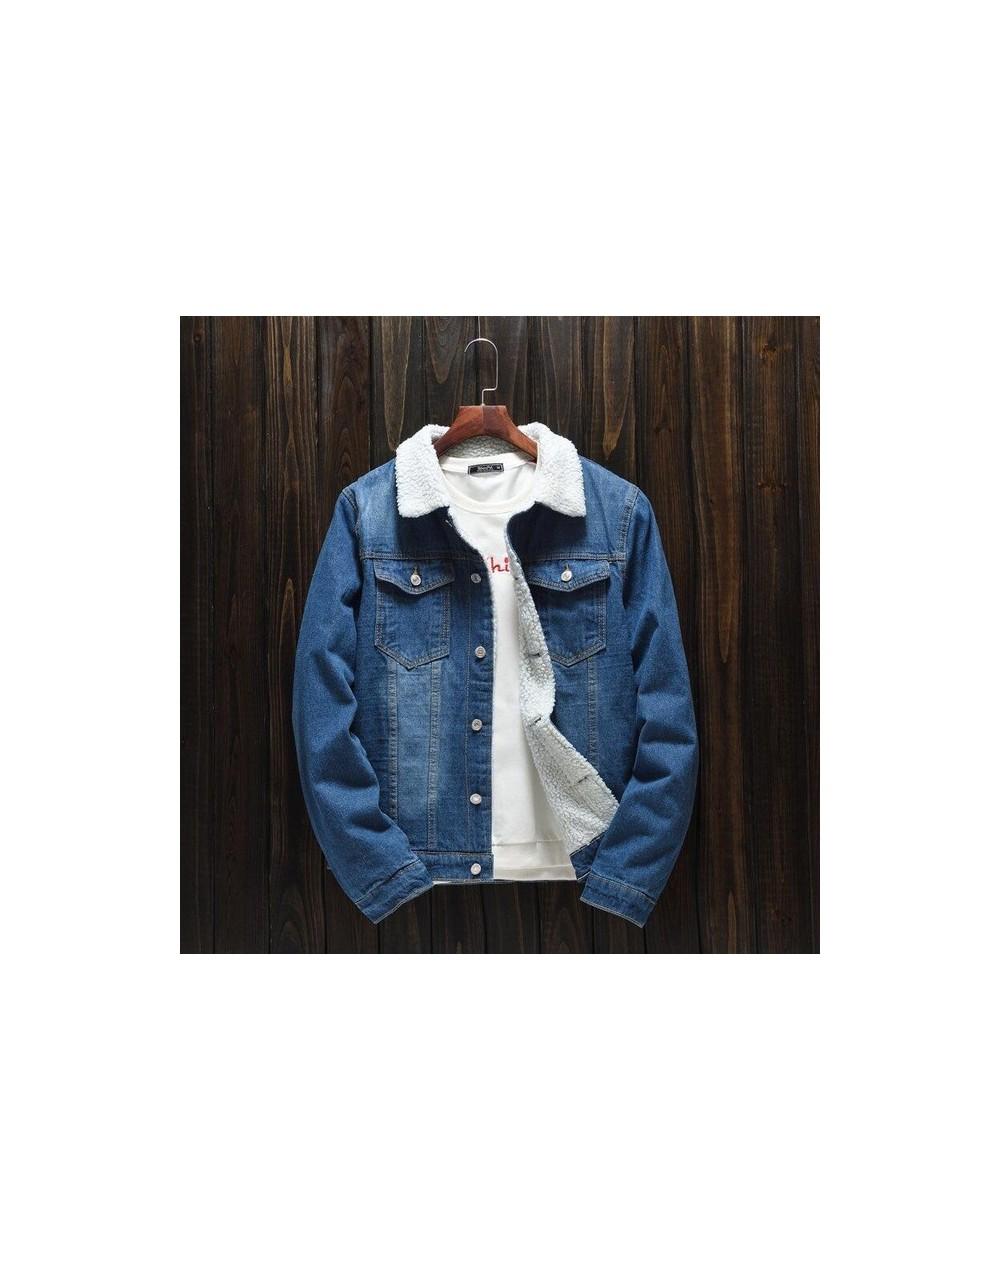 Autumn Winter Fur Denim Jacket Women Bomber Jacket Female Jeans Jacket Coat with Full Warm Lining & Front Button Flap Pocket...